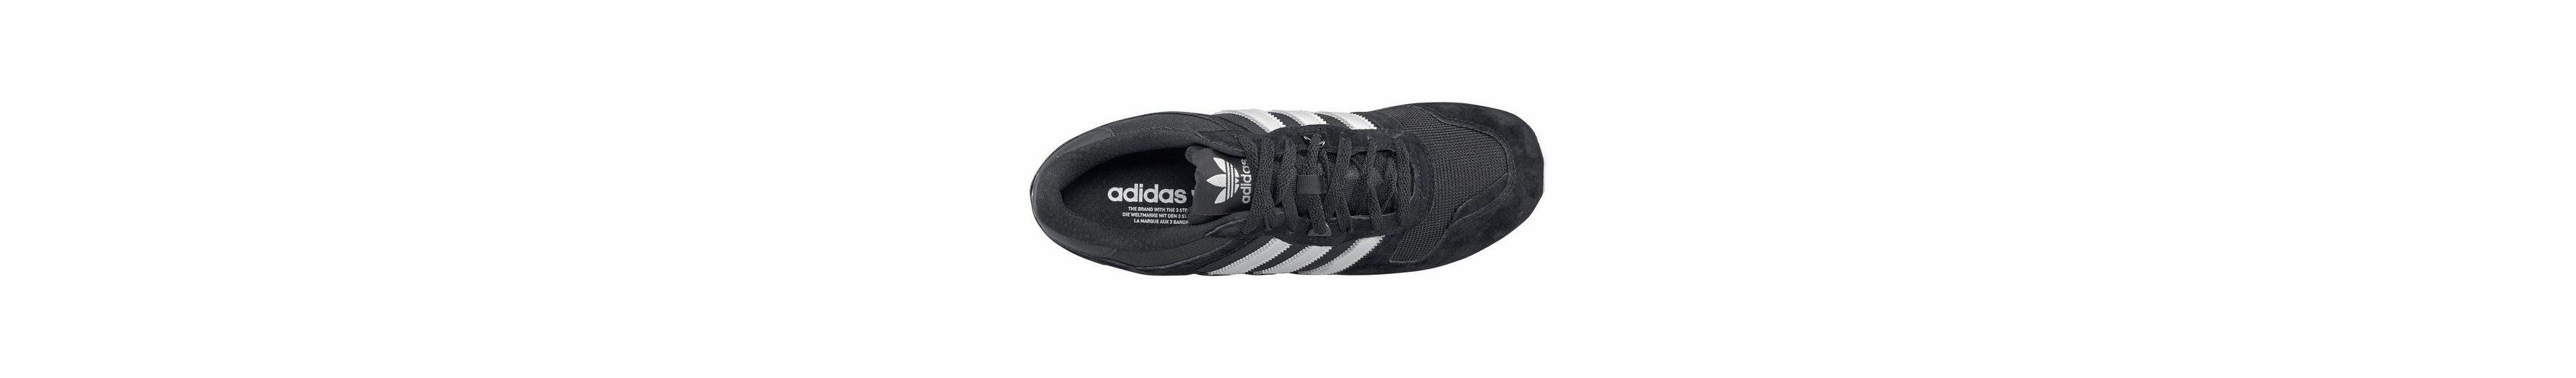 adidas Originals ZX 750 Sneaker Freies Verschiffen Offiziell SdMYJcAKm